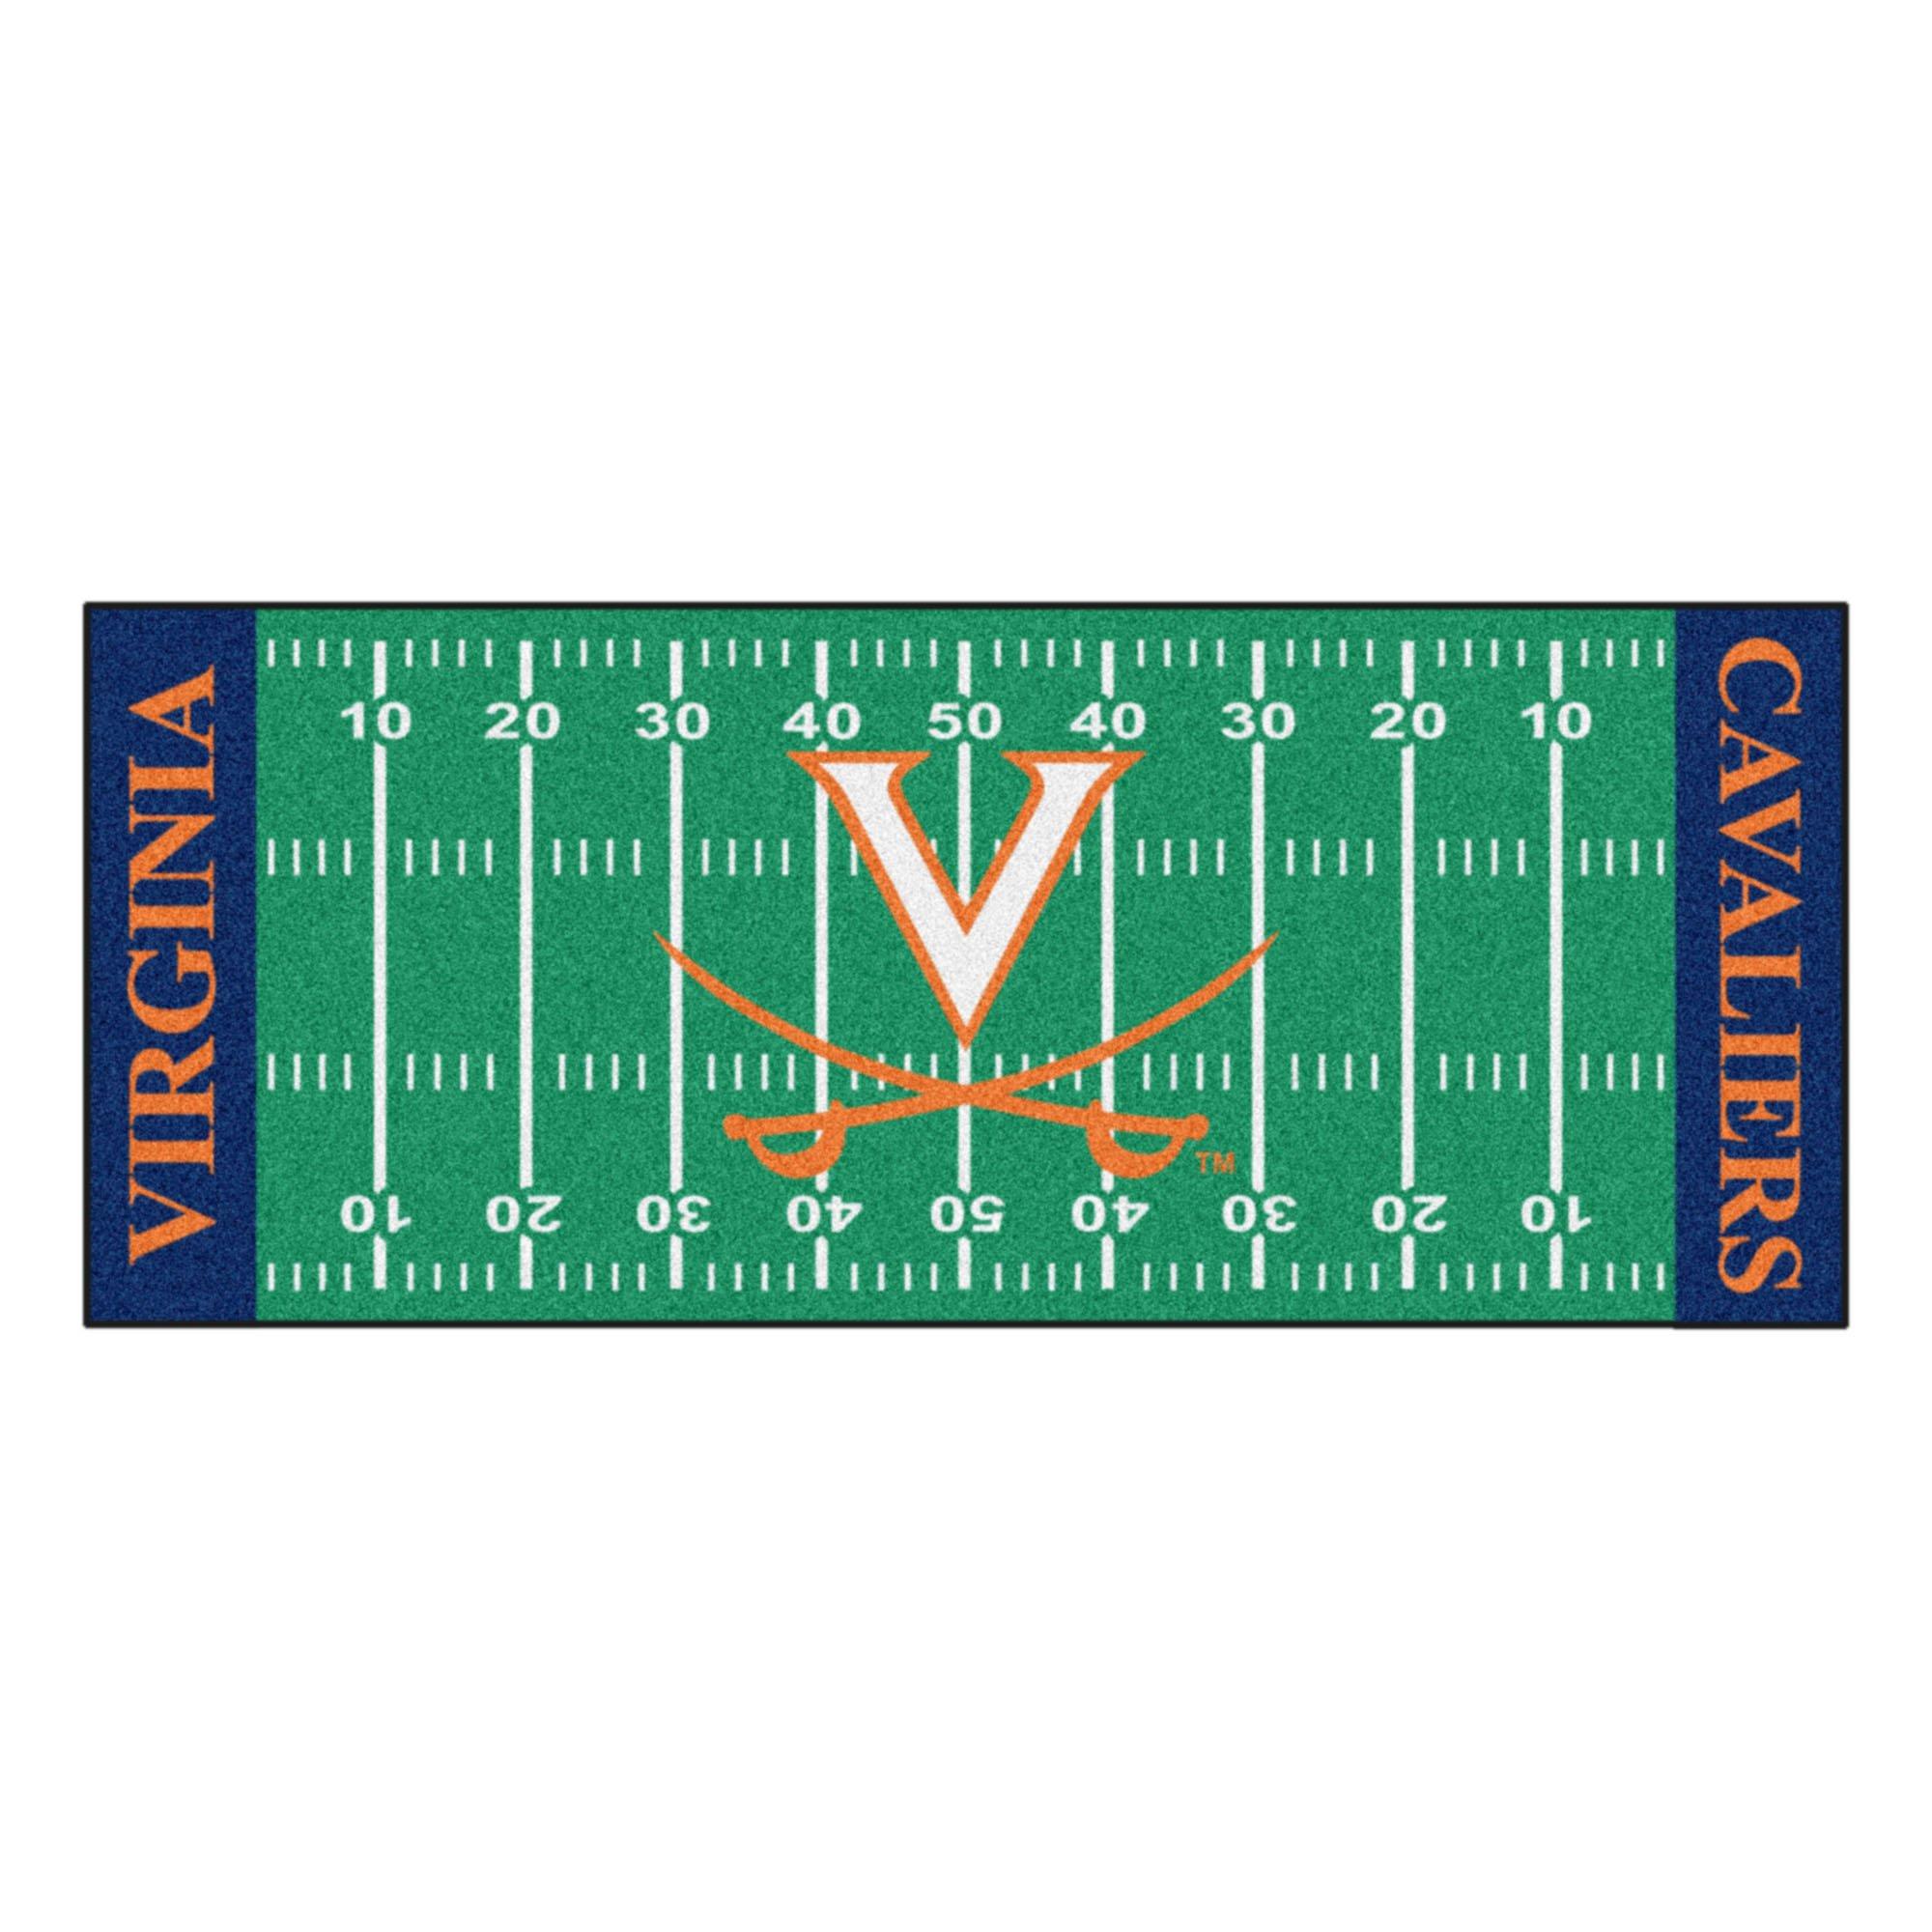 NCAA University of Virginia Cavaliers Football Field Runner Mat Area Rug